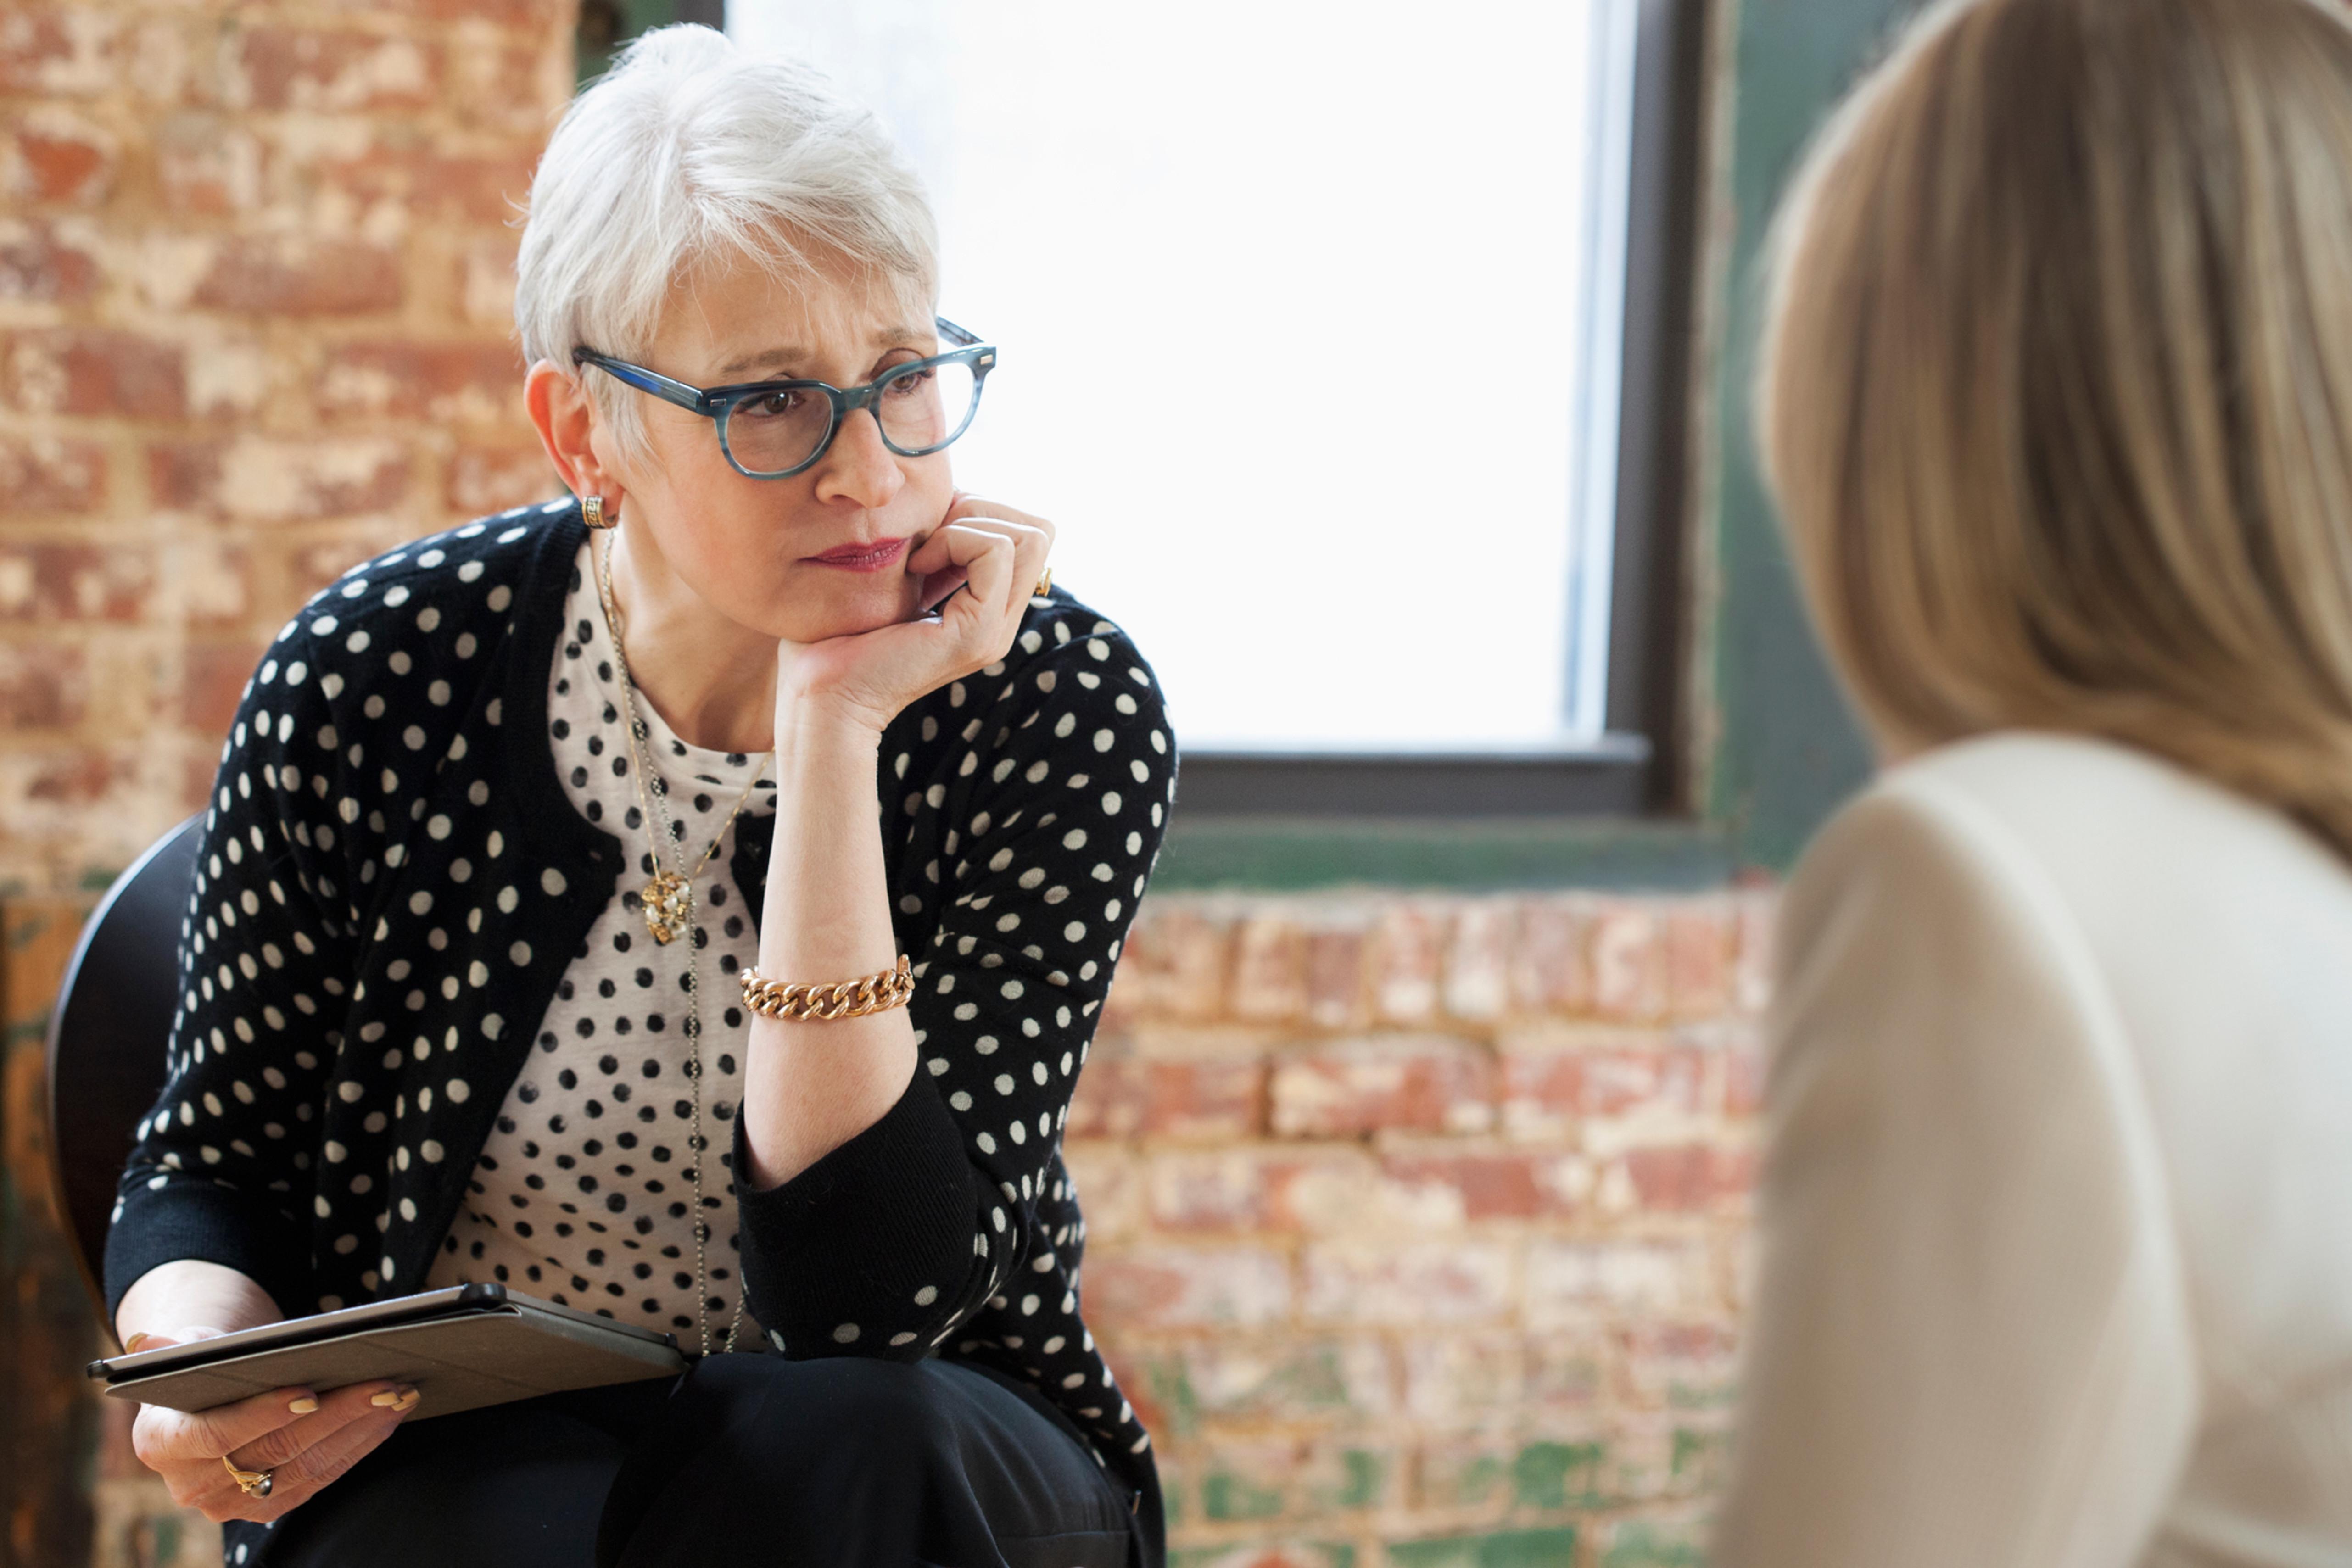 Consulta Psiquiatra de Adultos Online